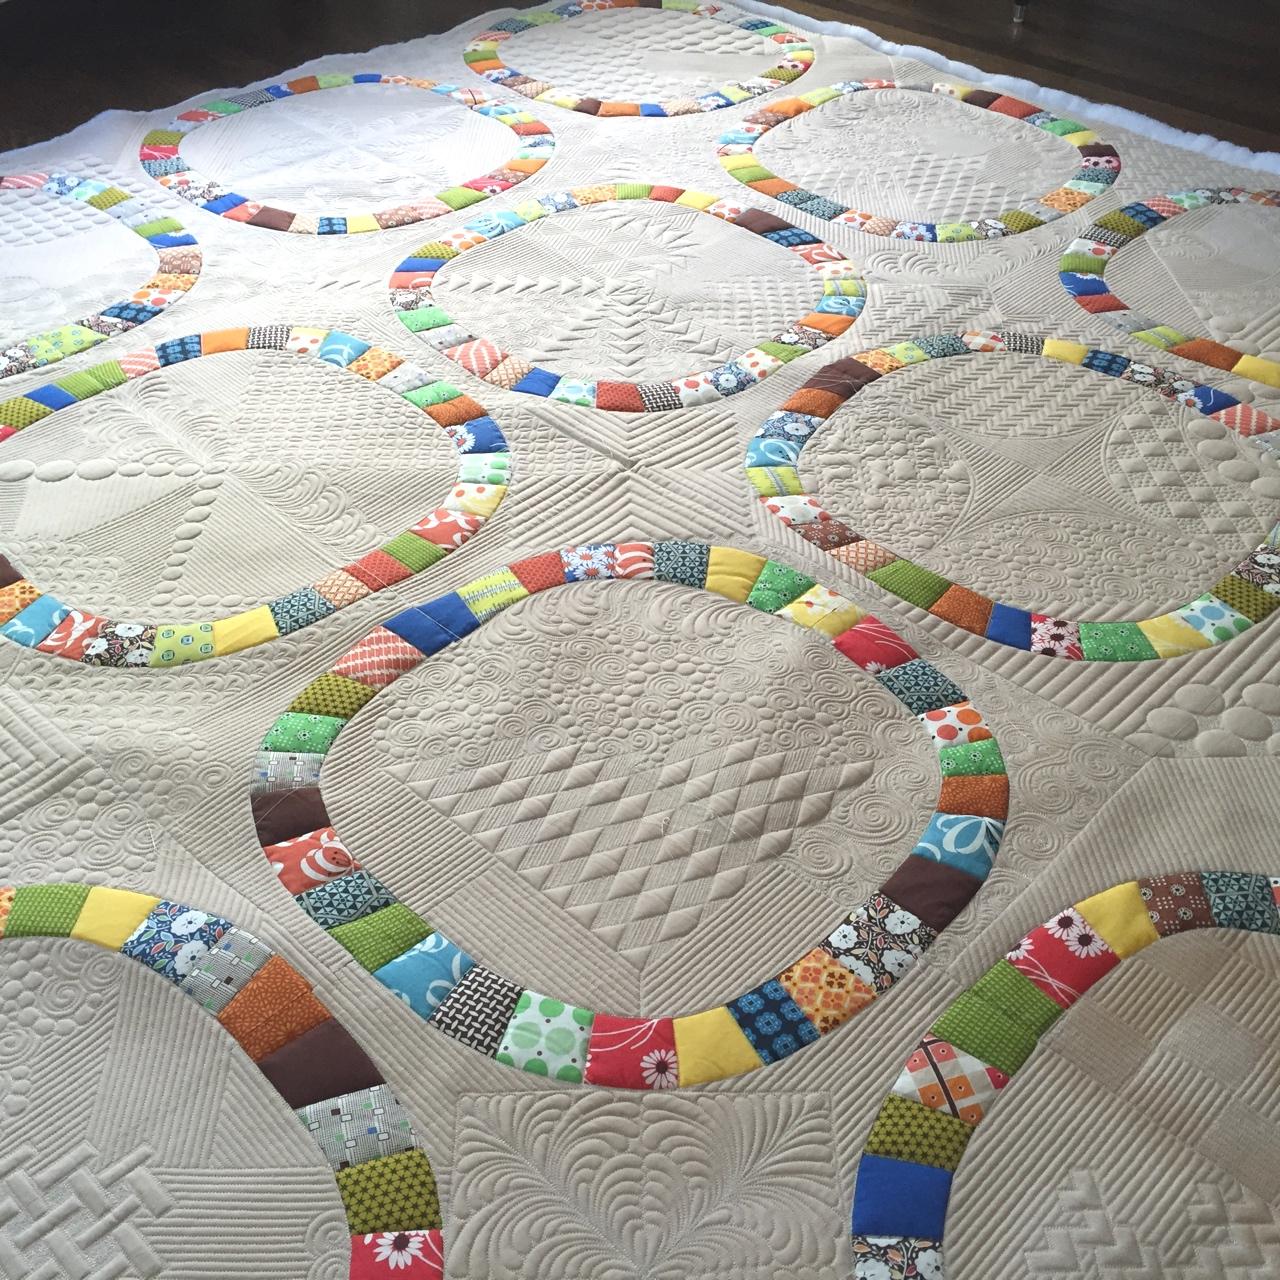 International Quilt Festival - Houston, TX (2017) - The Big O pieced by Lisa Mason & quilted by Rachael DorrWon 1 Award: Teachers choiceImage: Detail The Big O